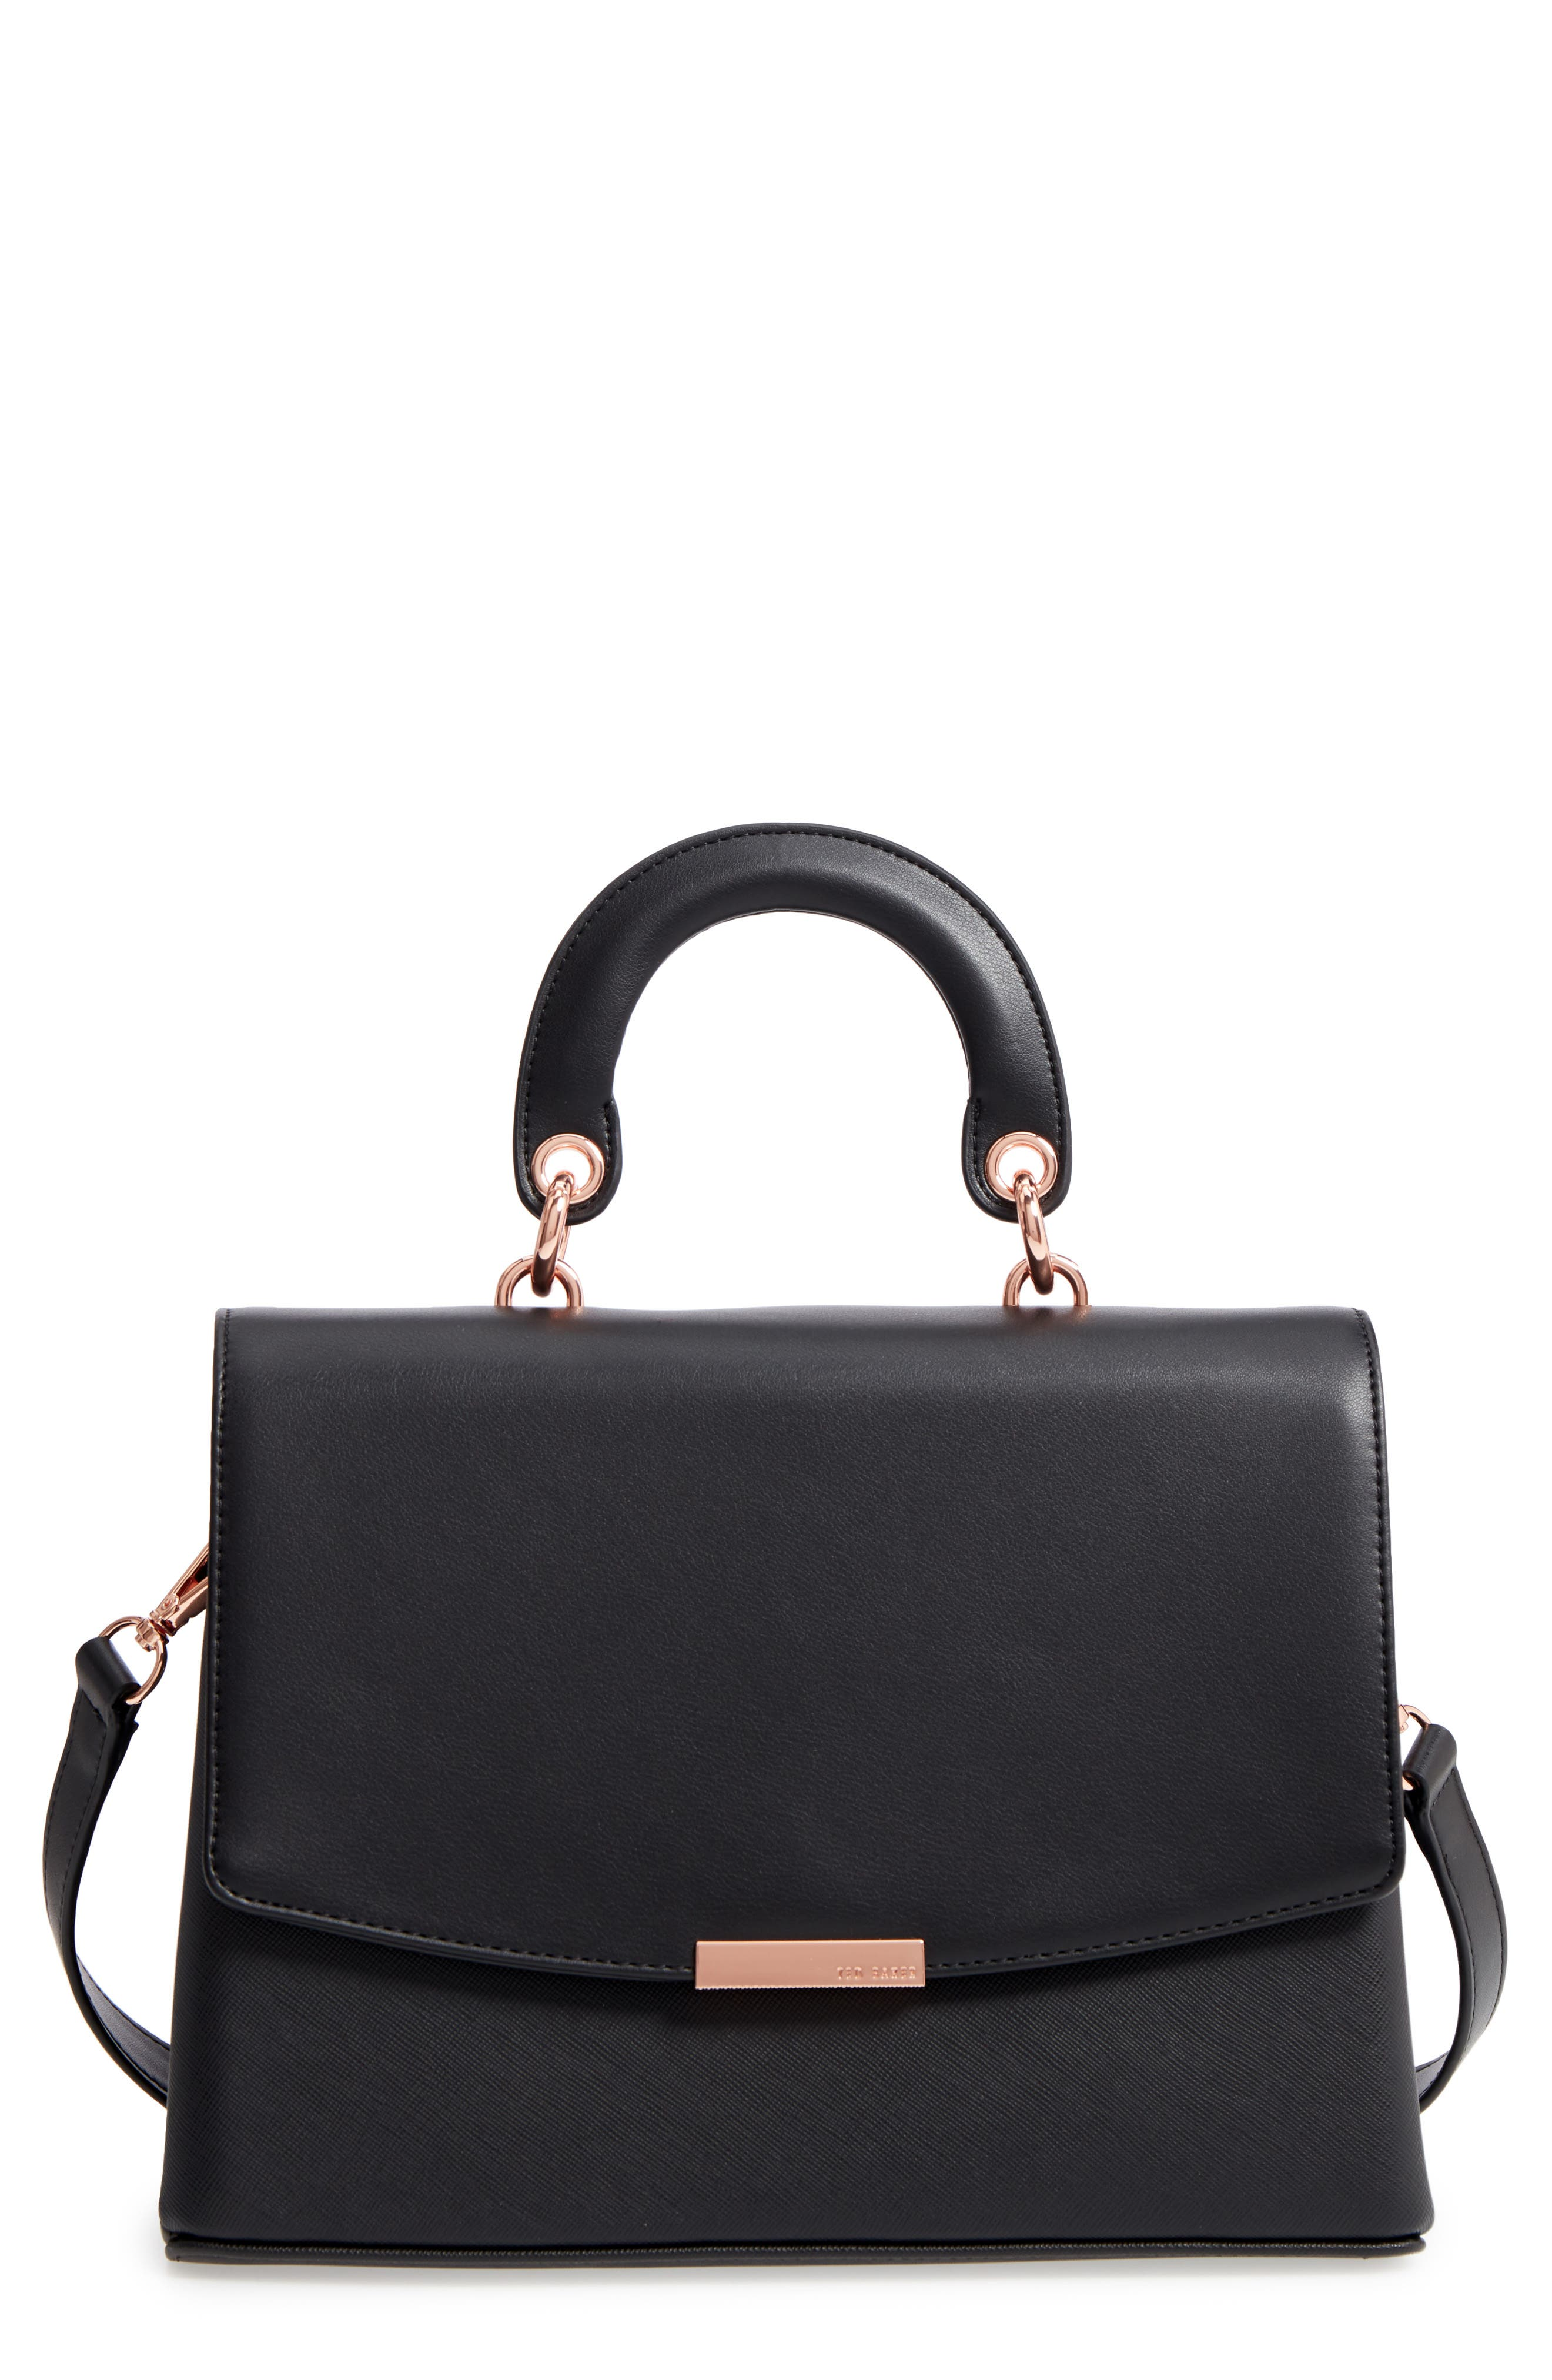 Keiira Lady Bag Faux Leather Top Handle Satchel,                         Main,                         color, 001